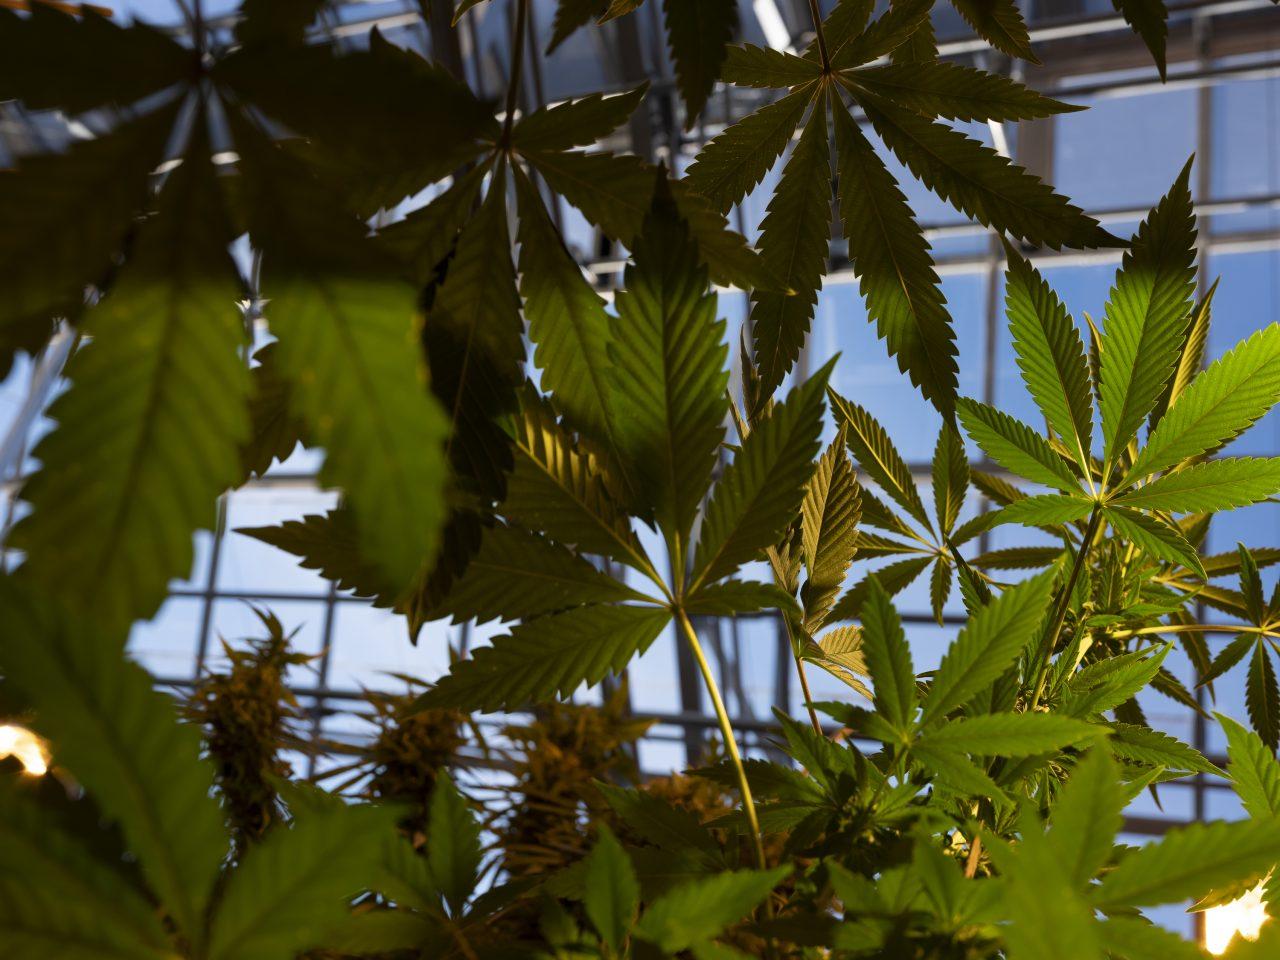 Marijuana plants at the Surge Laboratory in Geneva.